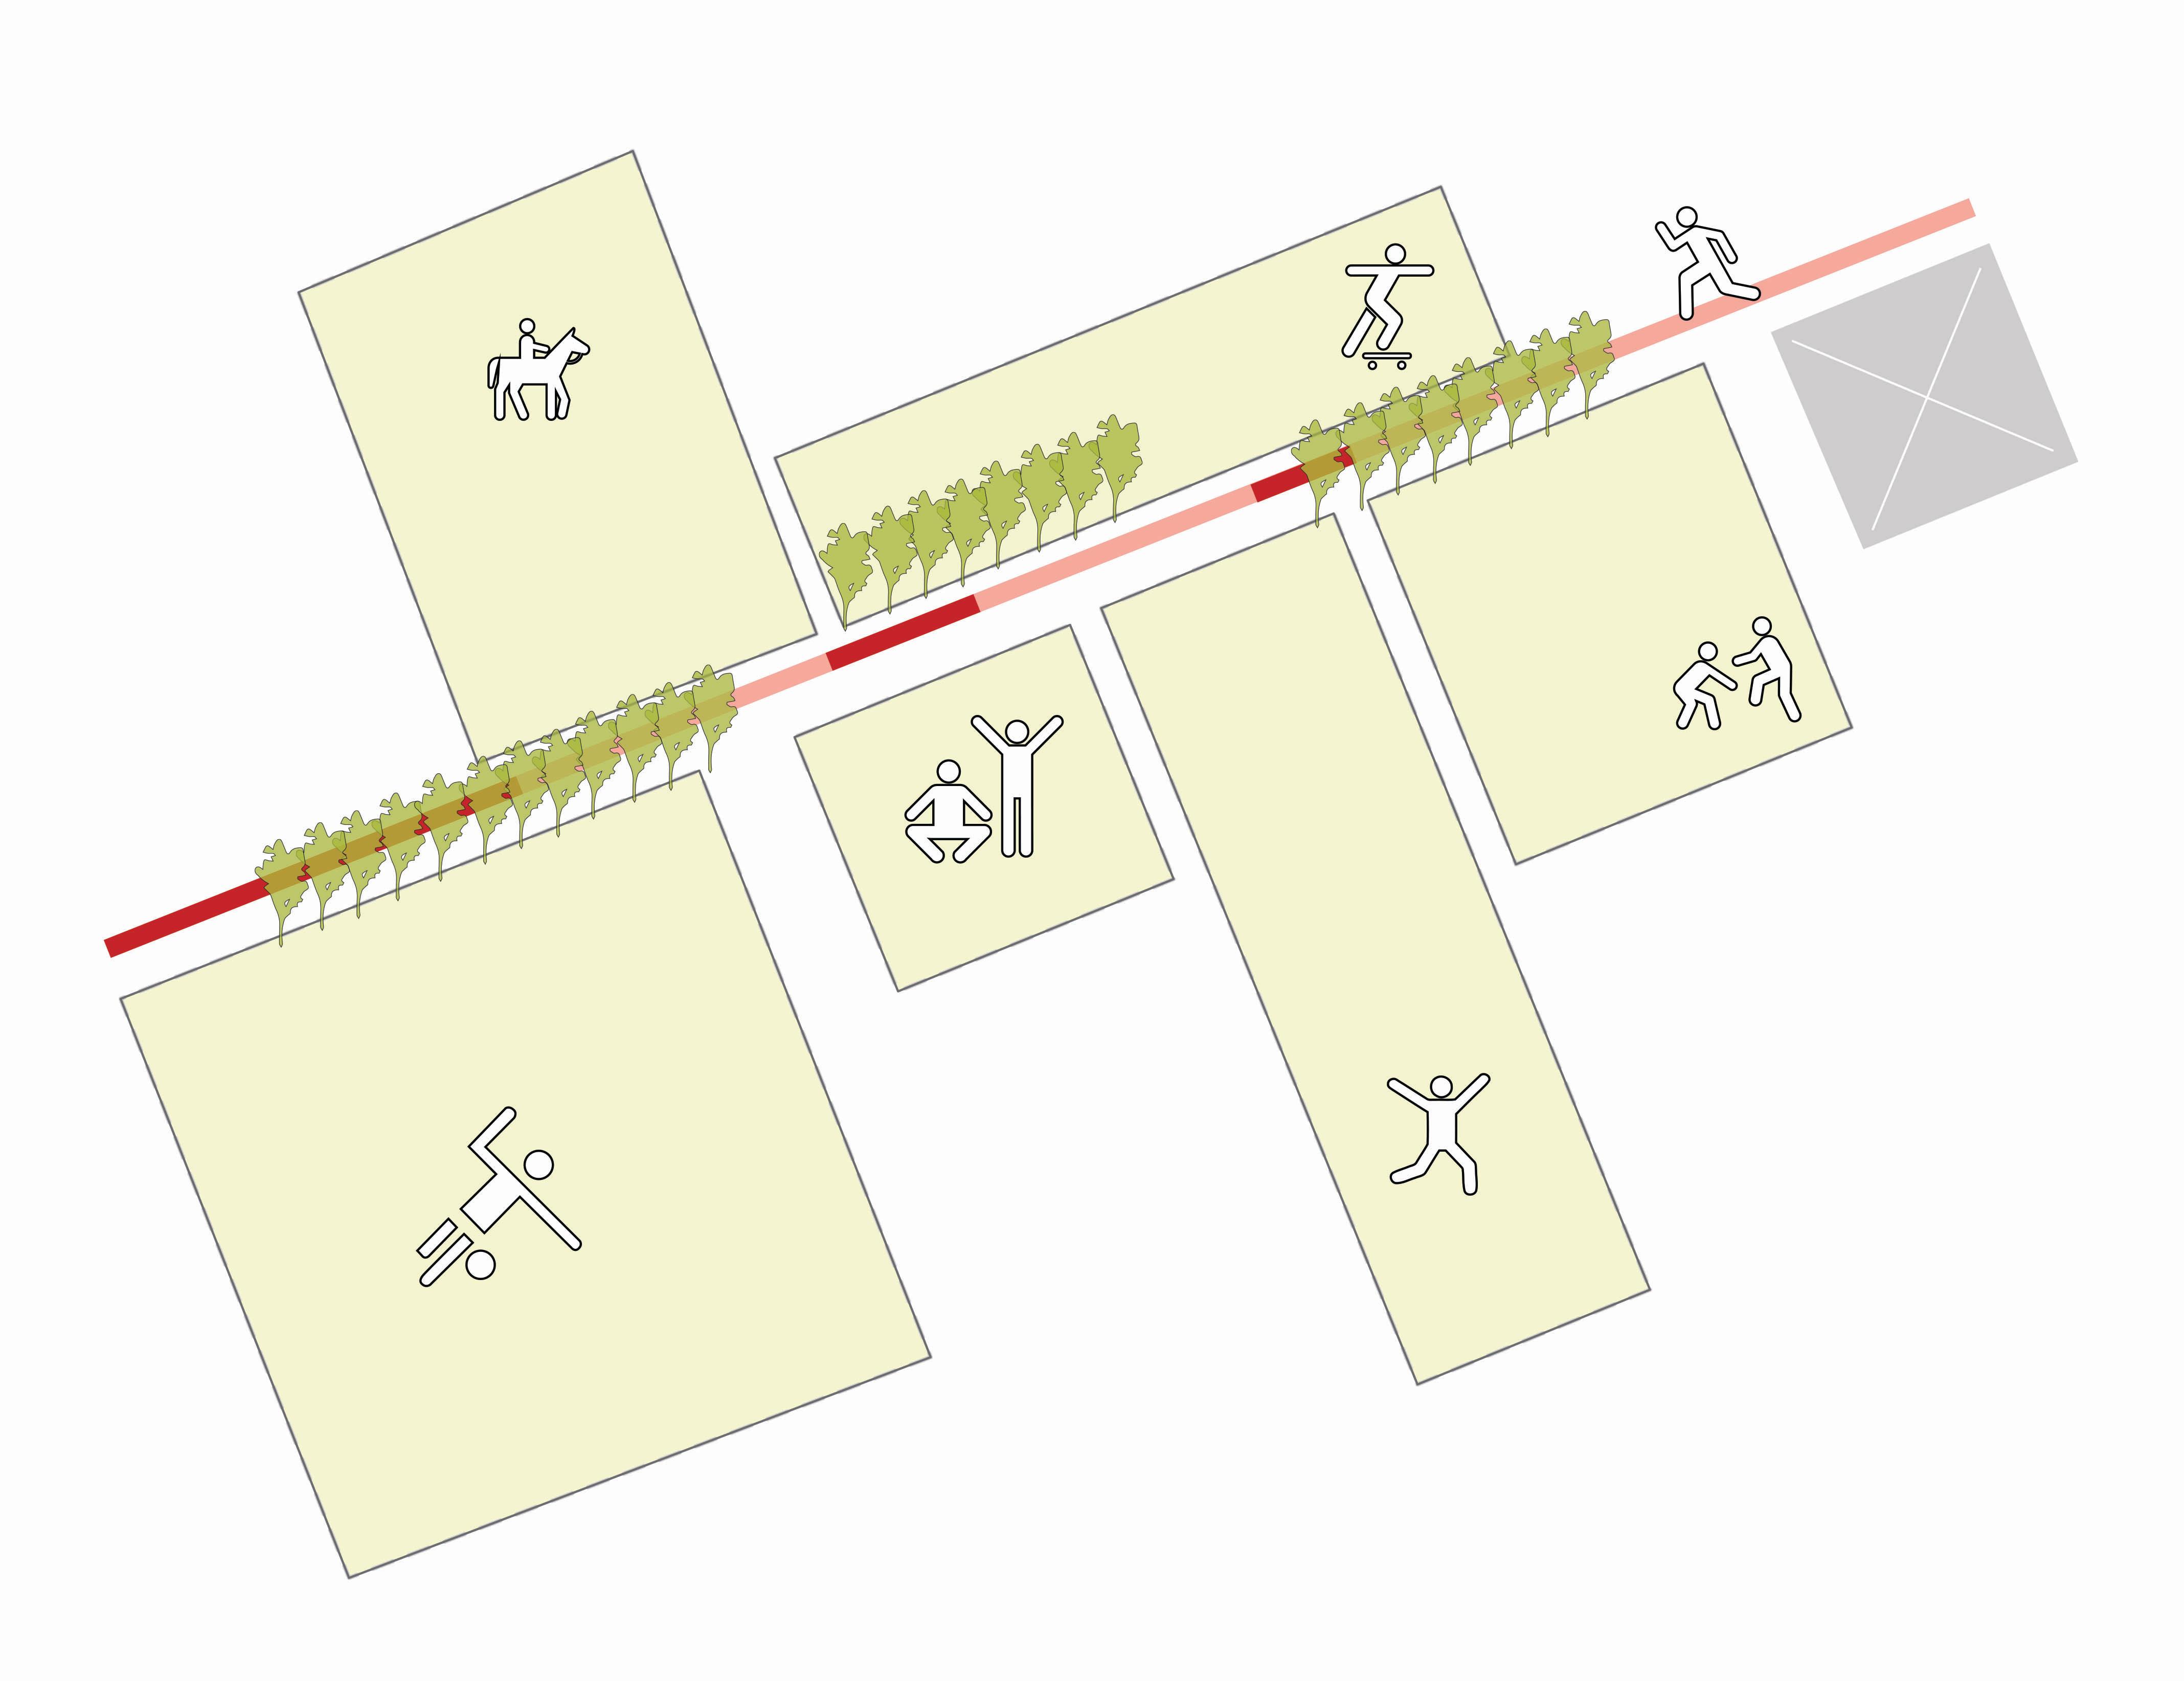 Inrichtingsplan Oosterlindenveld